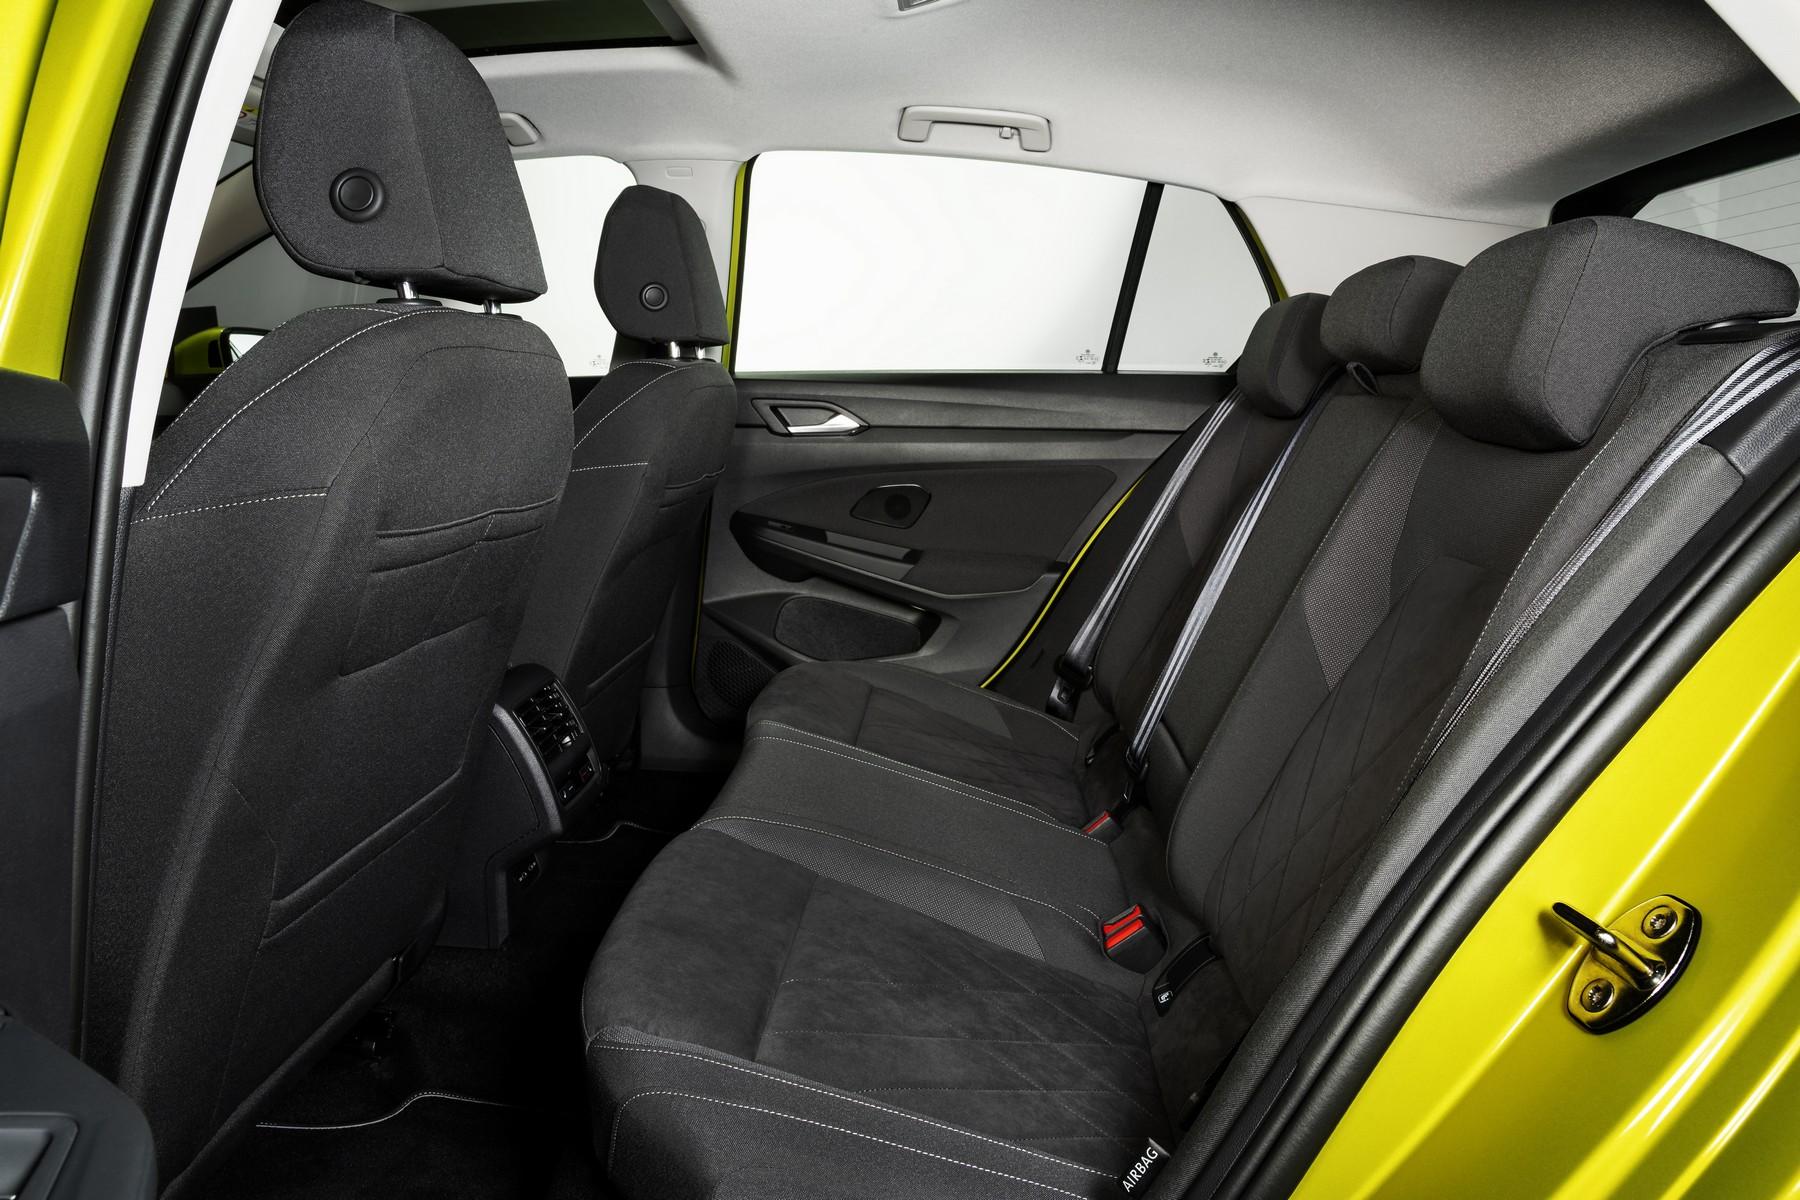 VW-Golf-8-13